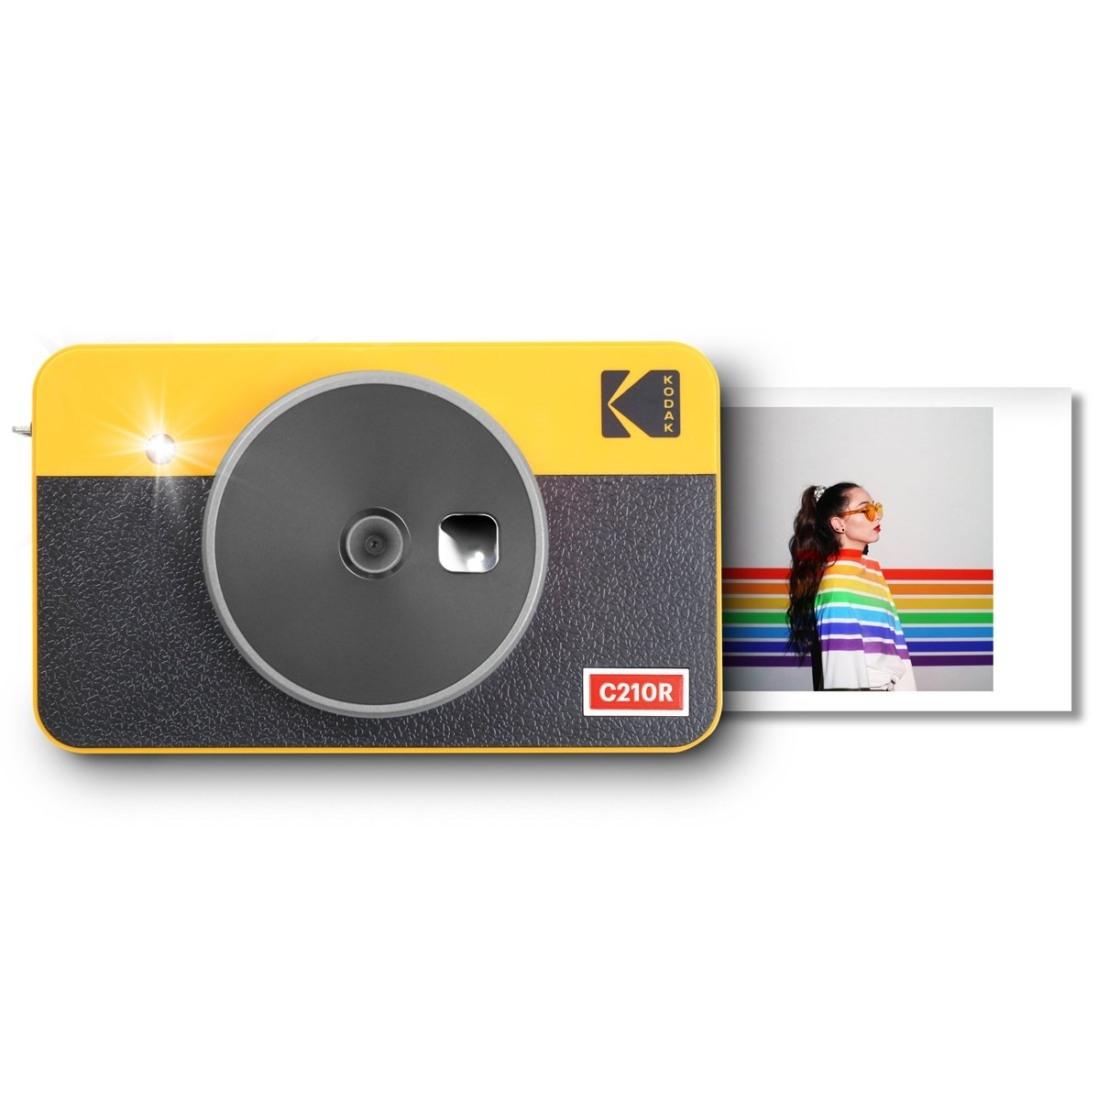 Kodak Mini Shot 2 Combo Retro Sofortbildkamera gelb